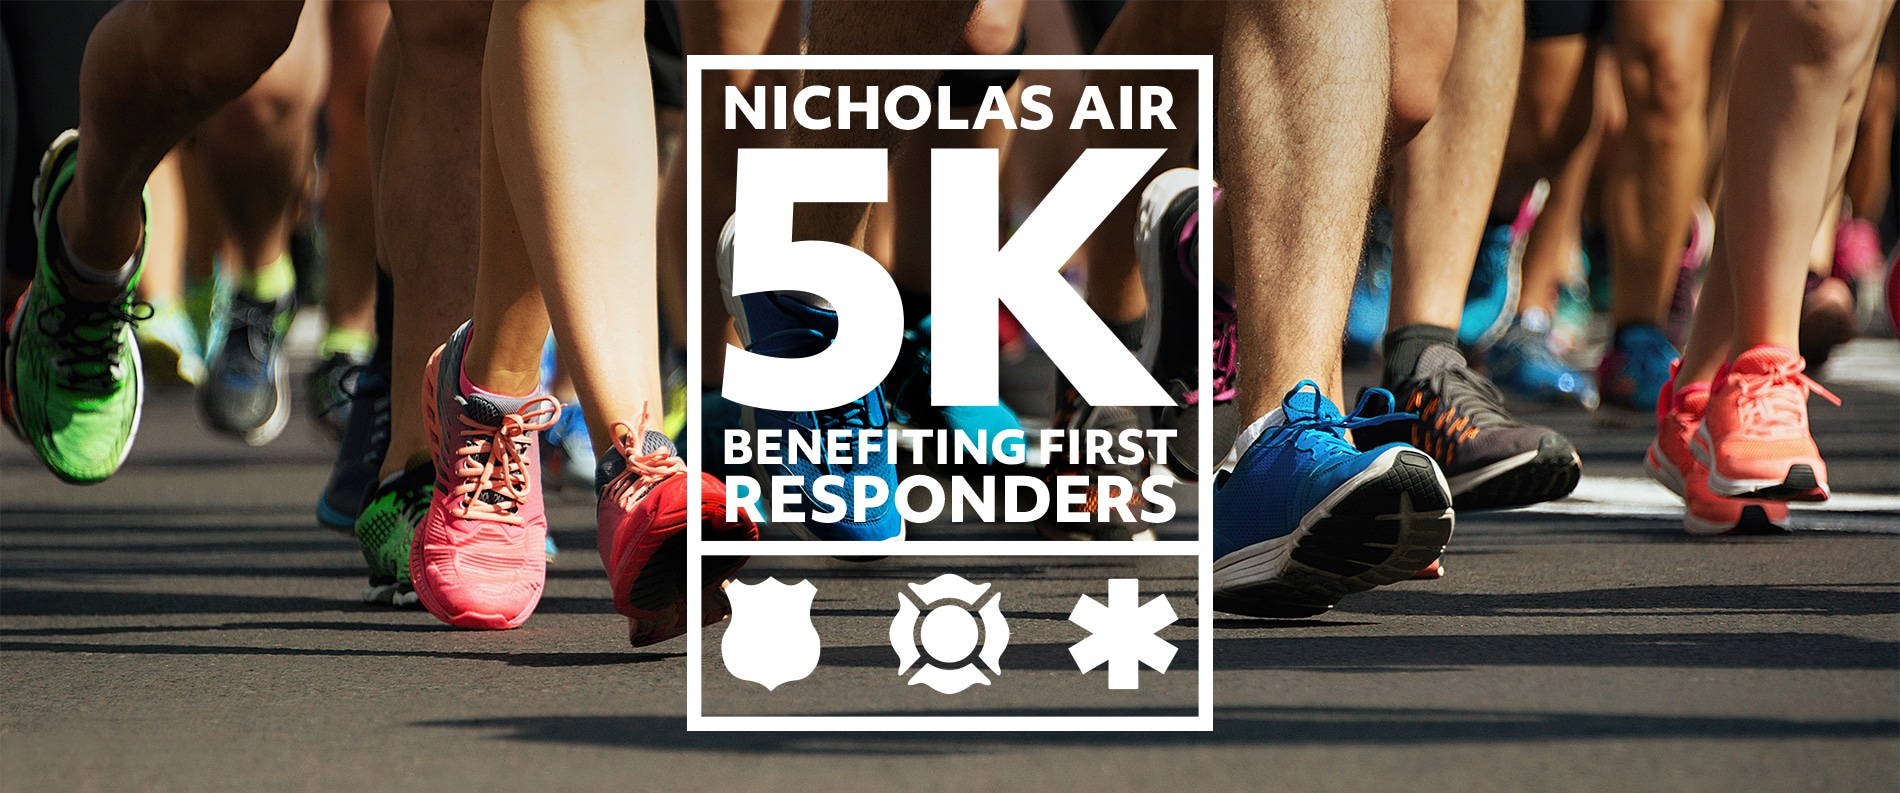 NICHOLAS AIR 5K